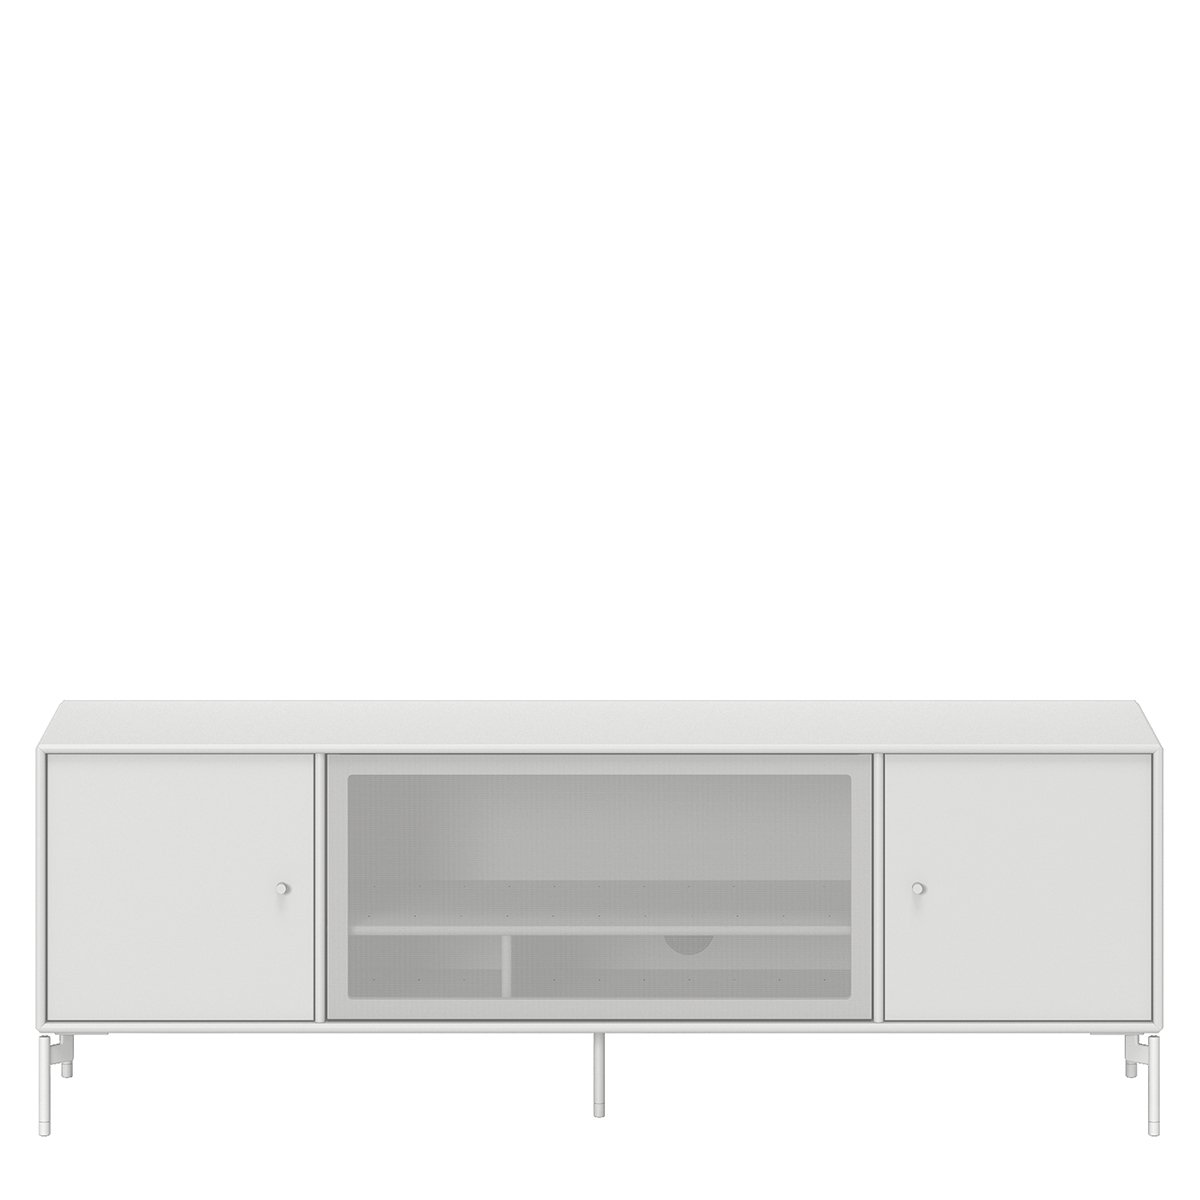 Montana Octave III Tv-meubel - New White